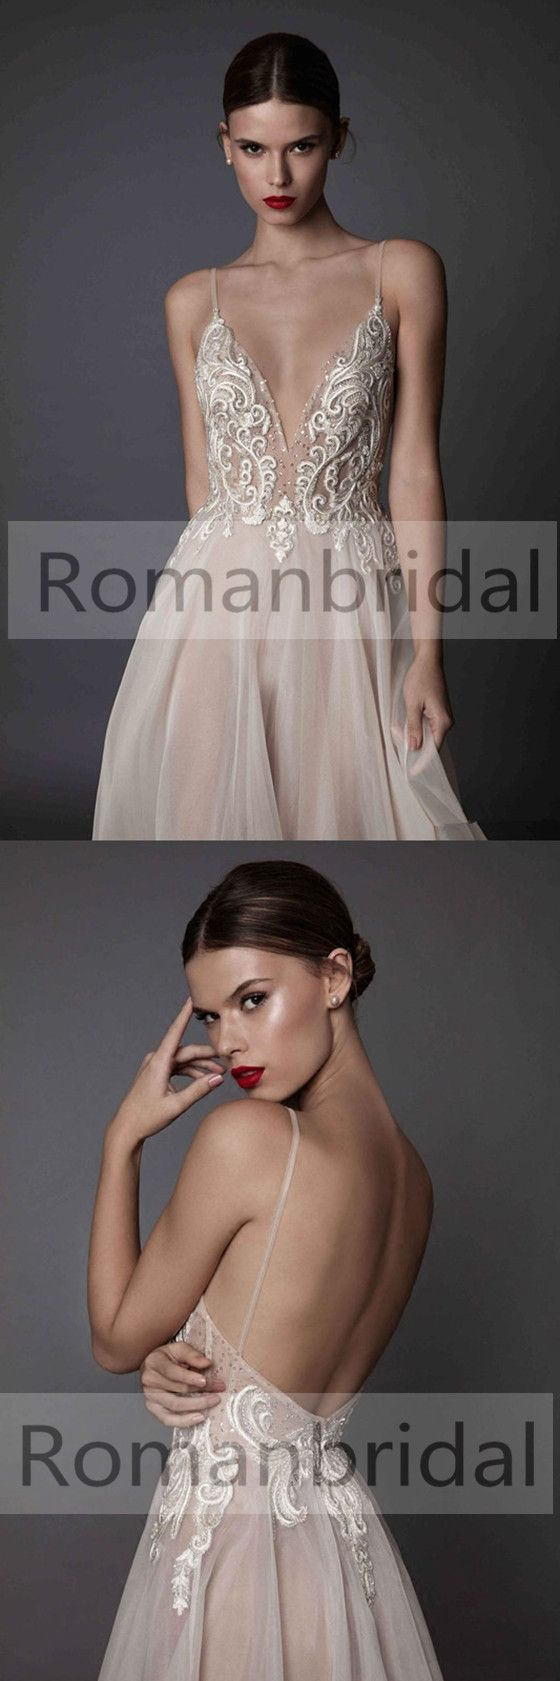 best prom dresses images on pinterest party wear dresses